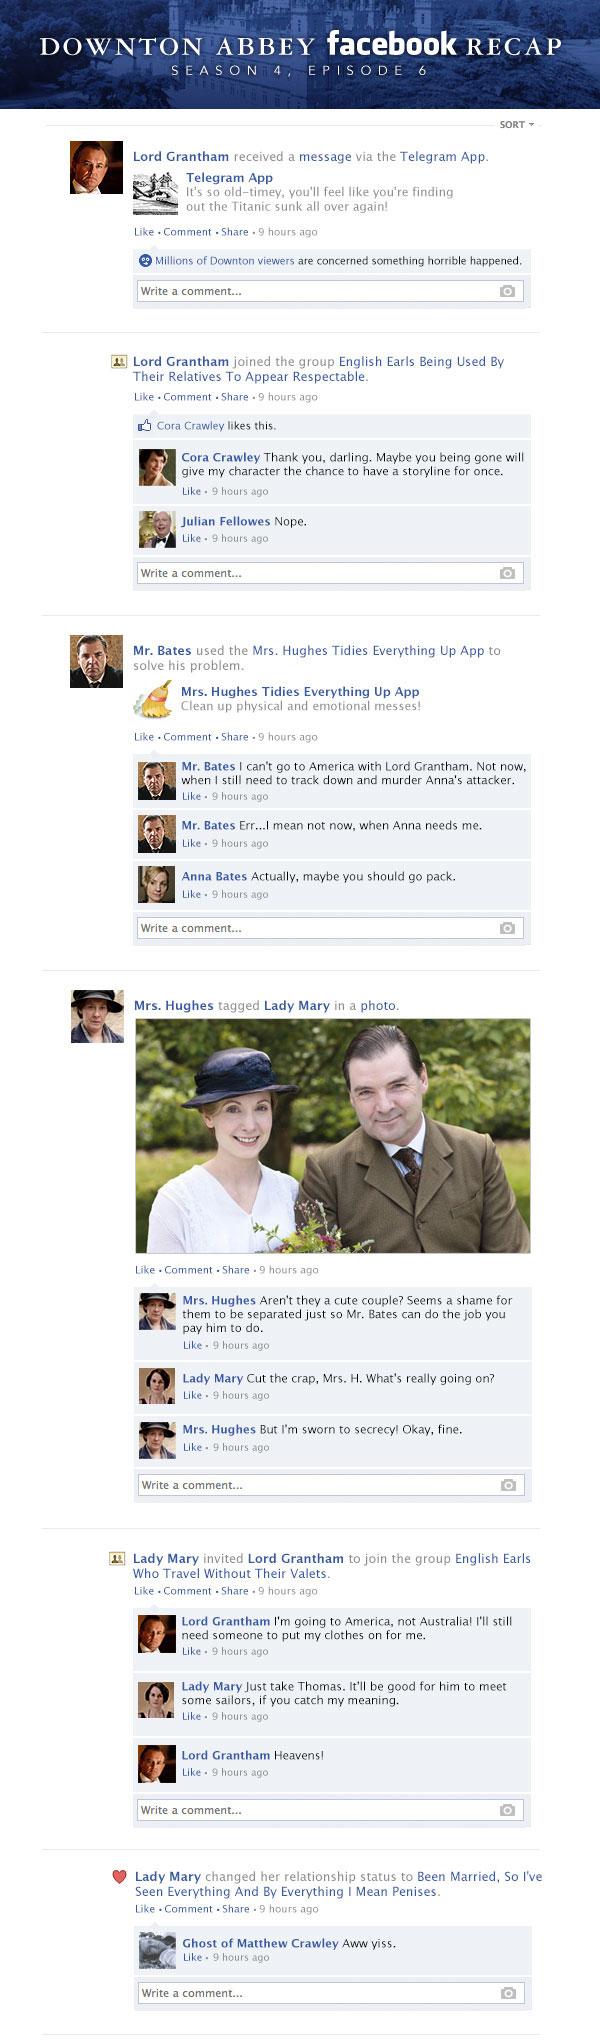 If Downton Abbey took place entirely on Facebook - Season 4, Episode 6 Recap.